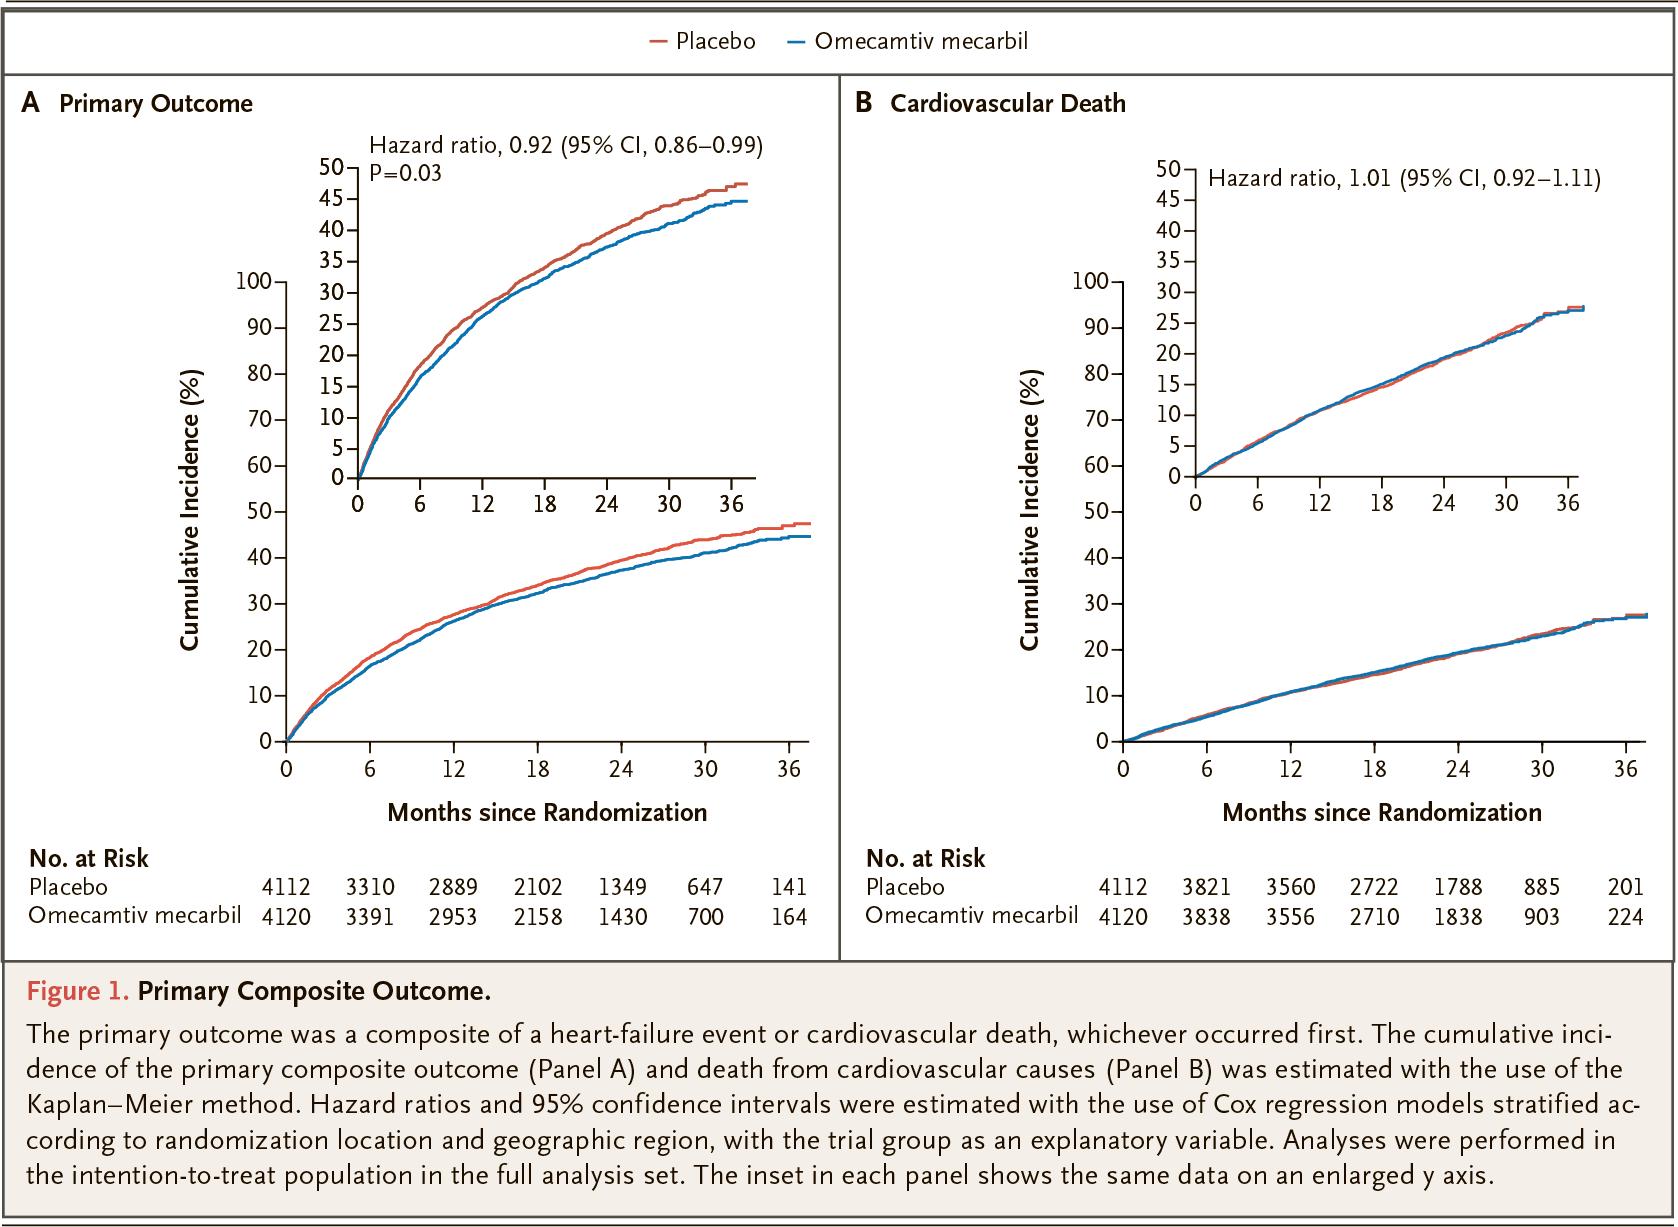 nct02929329 results 01 - Омекамтив мекарбил от сердечной недостаточности: хорошо, да худо